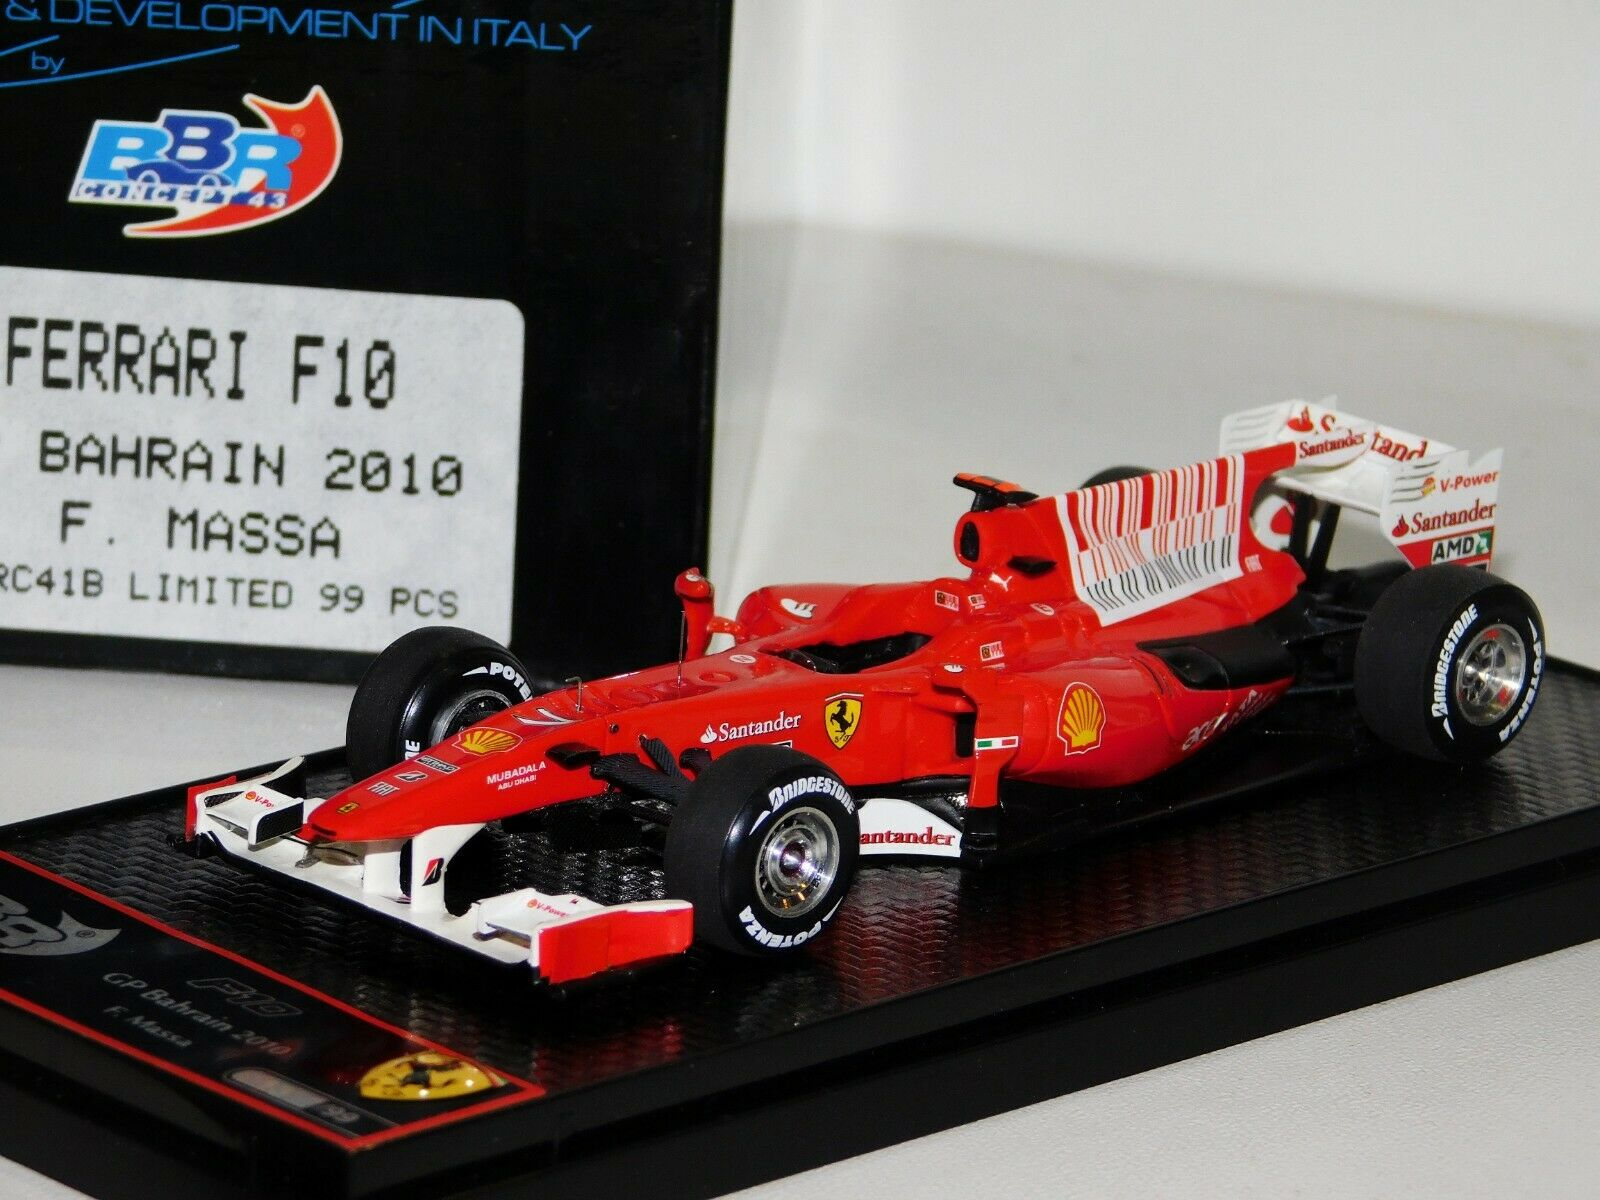 Ferrari F10 Bahrain GP 2010 F MASSA BBR Lim. 1 43